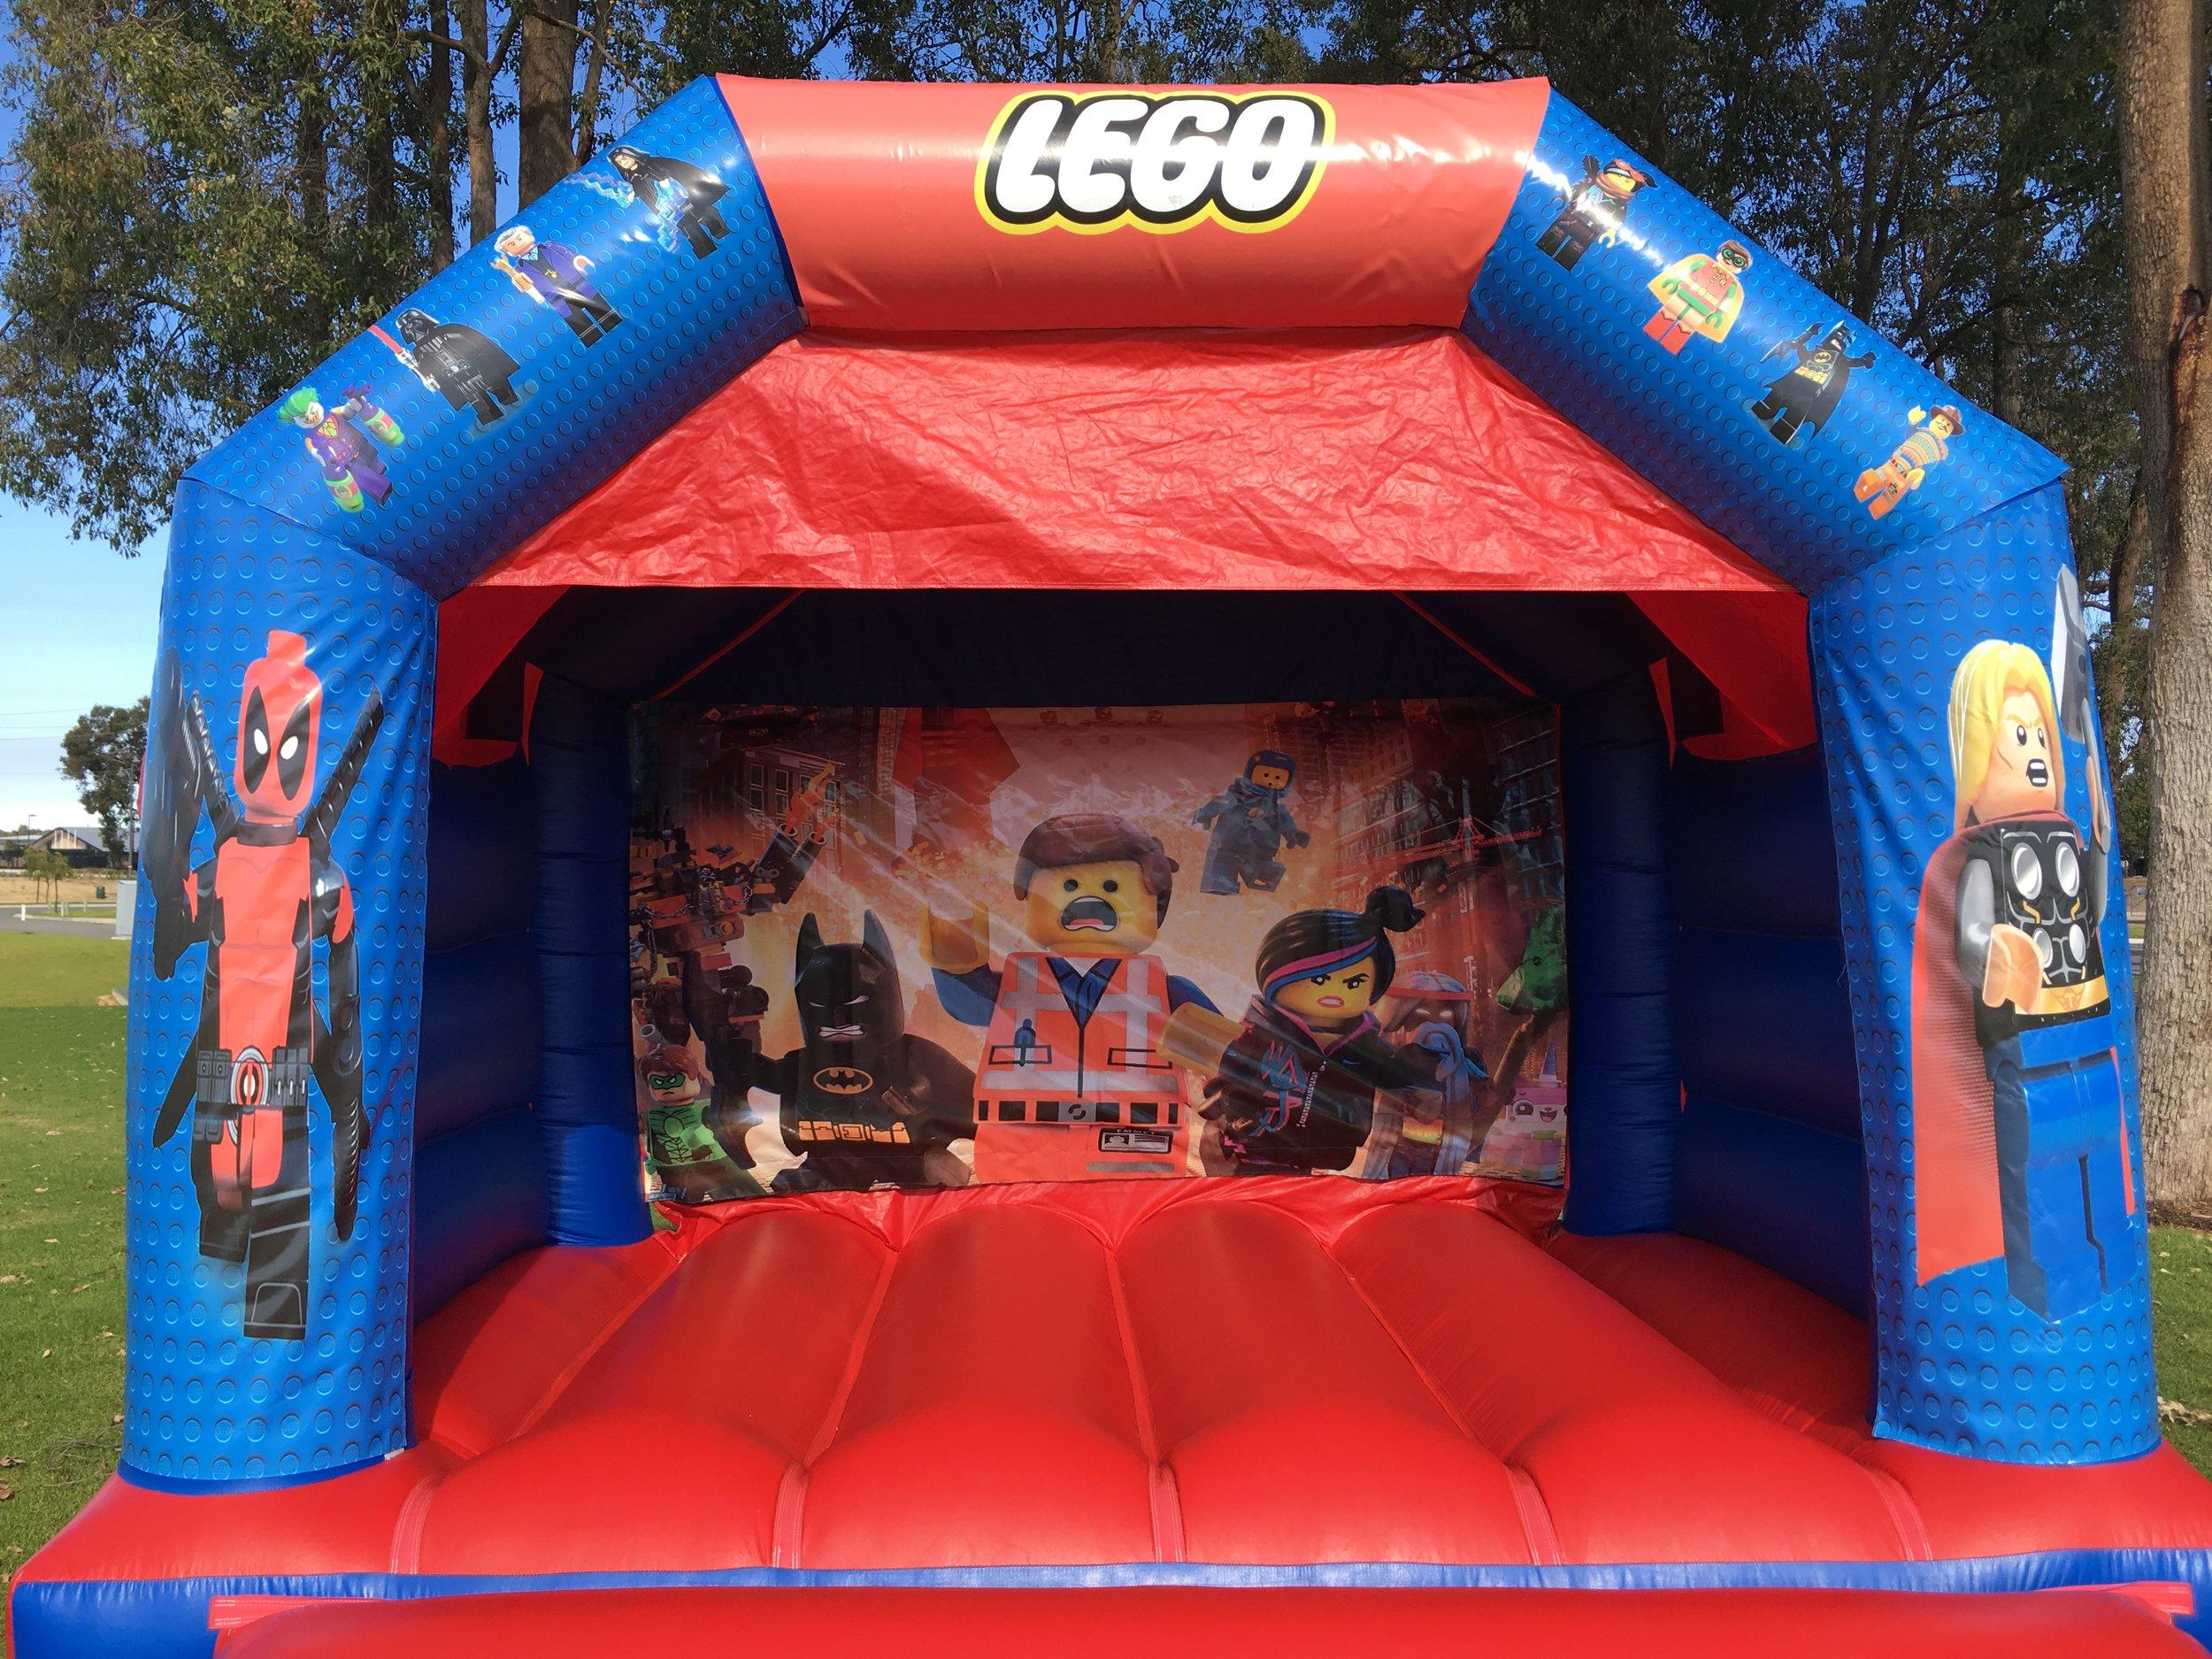 Lego Bouncy Castle Hire Mandurah